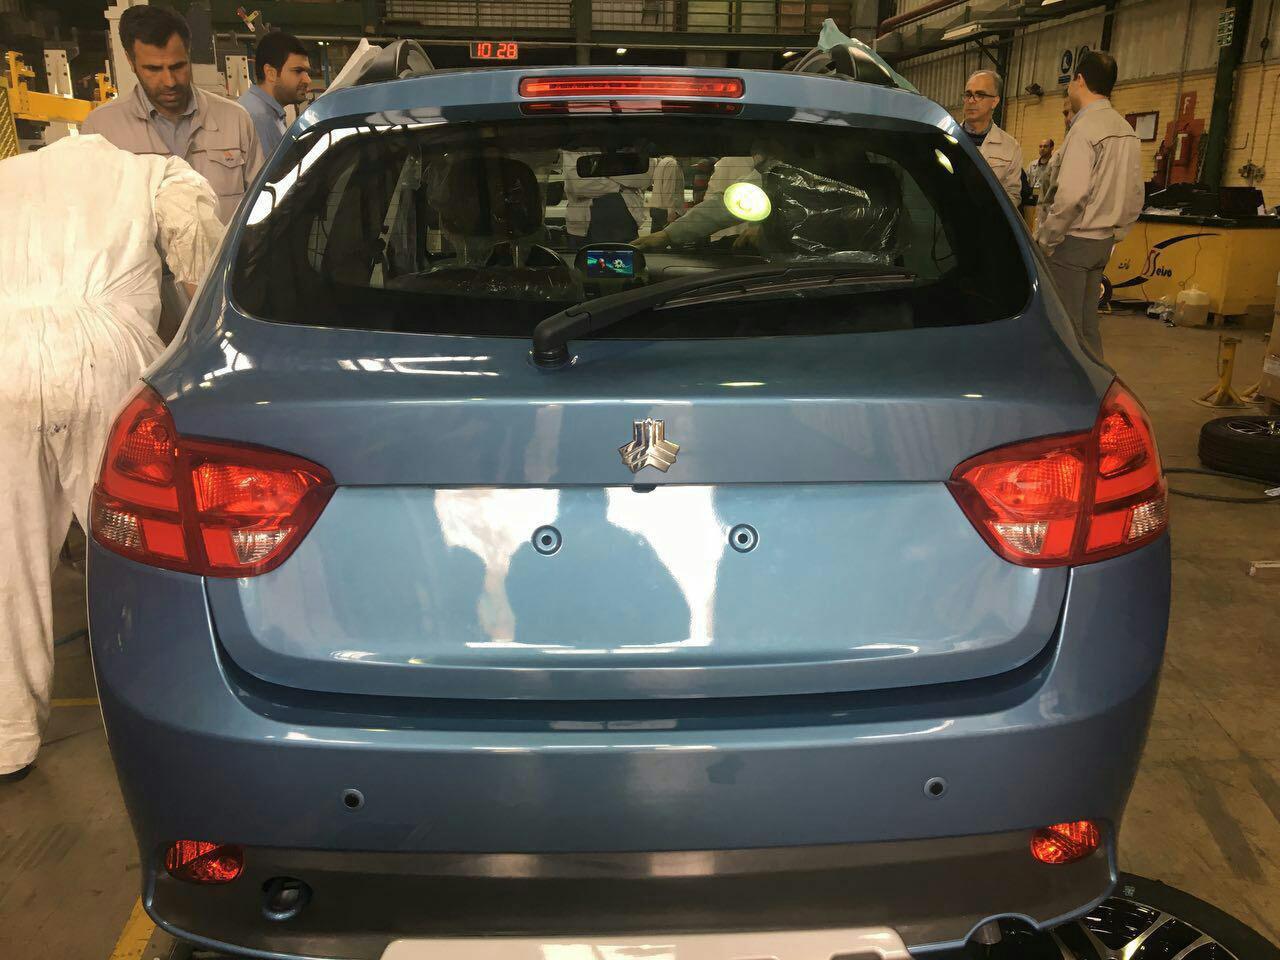 SAIPA Unveils Irans Cheapest Car with Auto Transmission